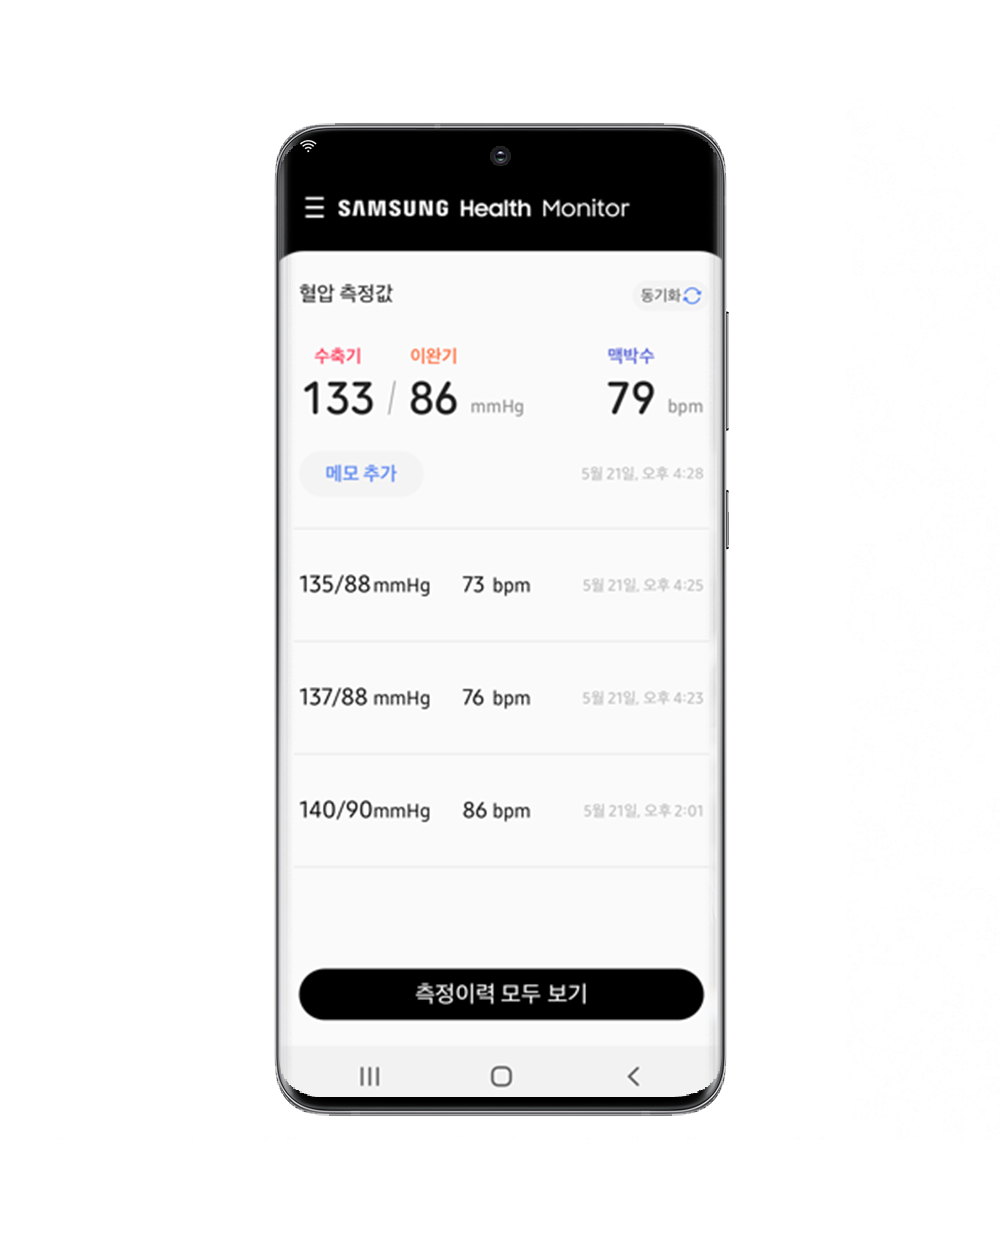 Samsung Health Monitor 혈압 측정값 동기화 수축기 이완기 맥박수 133/86 mmHg 79 bpm 메모 추가 5월 21일 오후 4:28 135/88 mmHg 73bpm 5월 21일 오후 4:25 137/88 mmHg 76 bpm 5월 21일 오후 4:23 140/90 mmHg 86 bpm 5월 21일 오후 2:01 측정이력 모두 보기